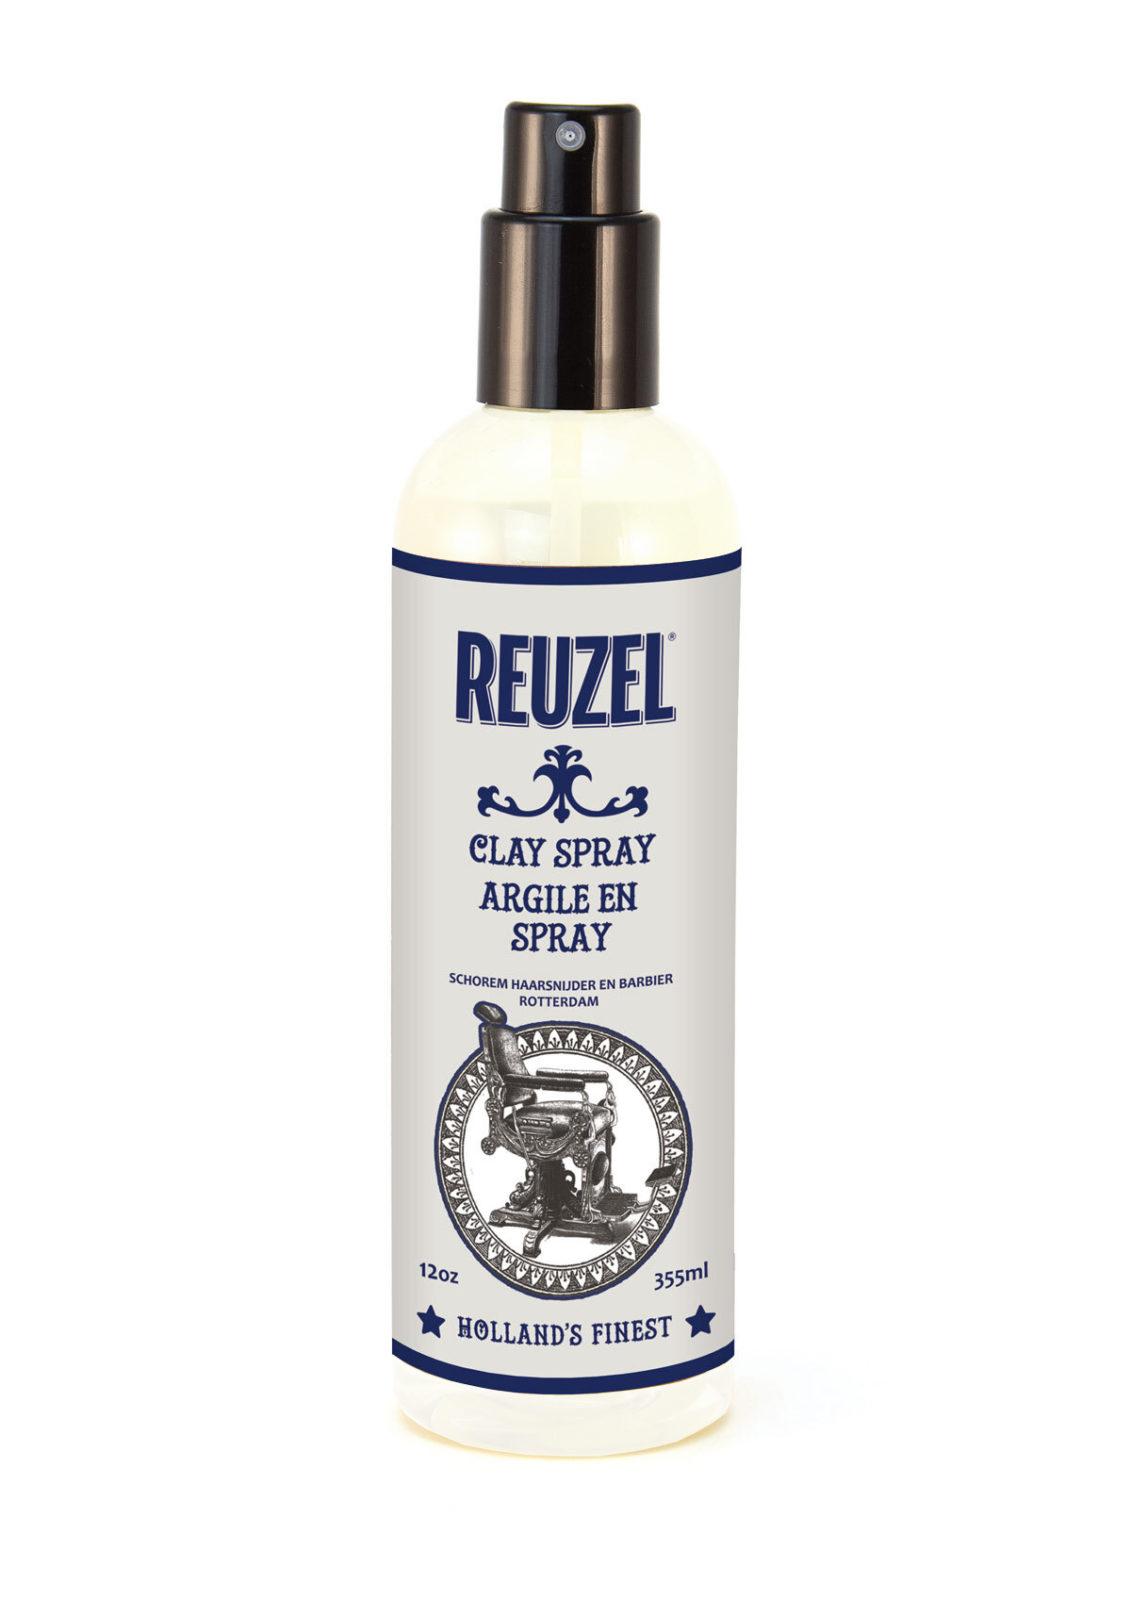 Tuotekuva: Reuzel Clay Spray -vahasuihke (355 ml)